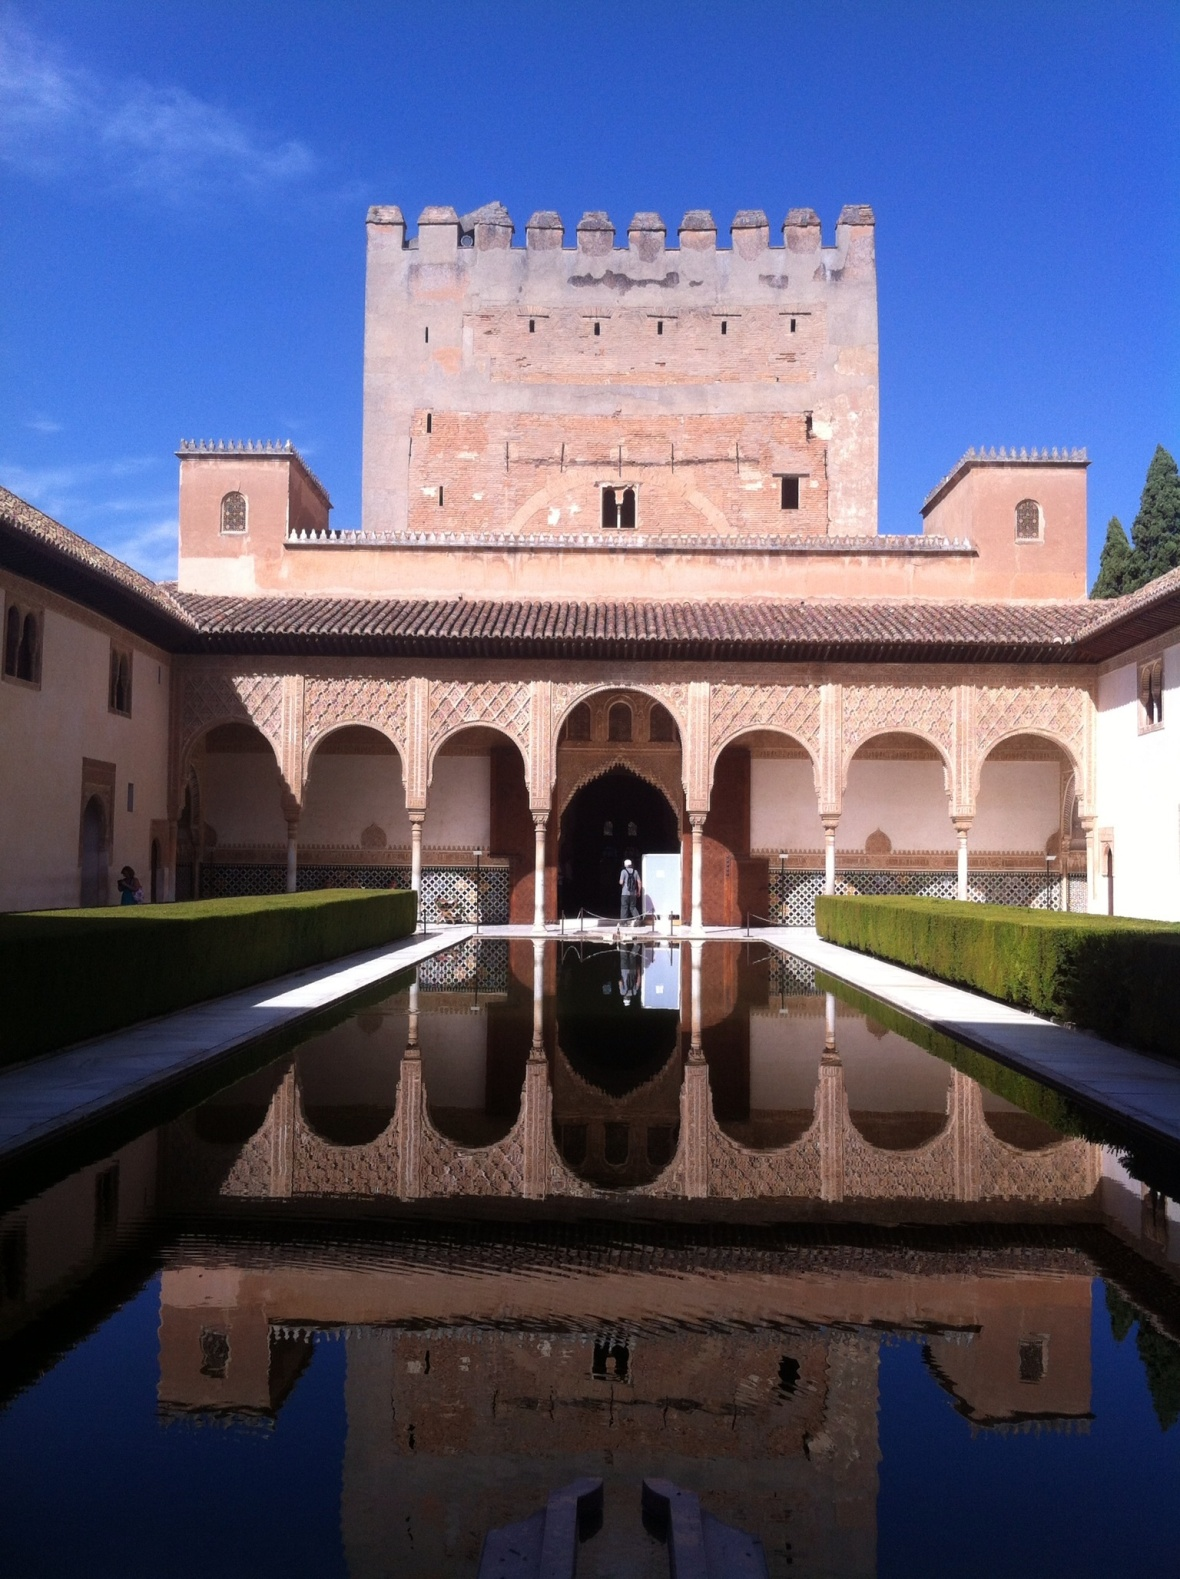 The View Today: La Alhambra